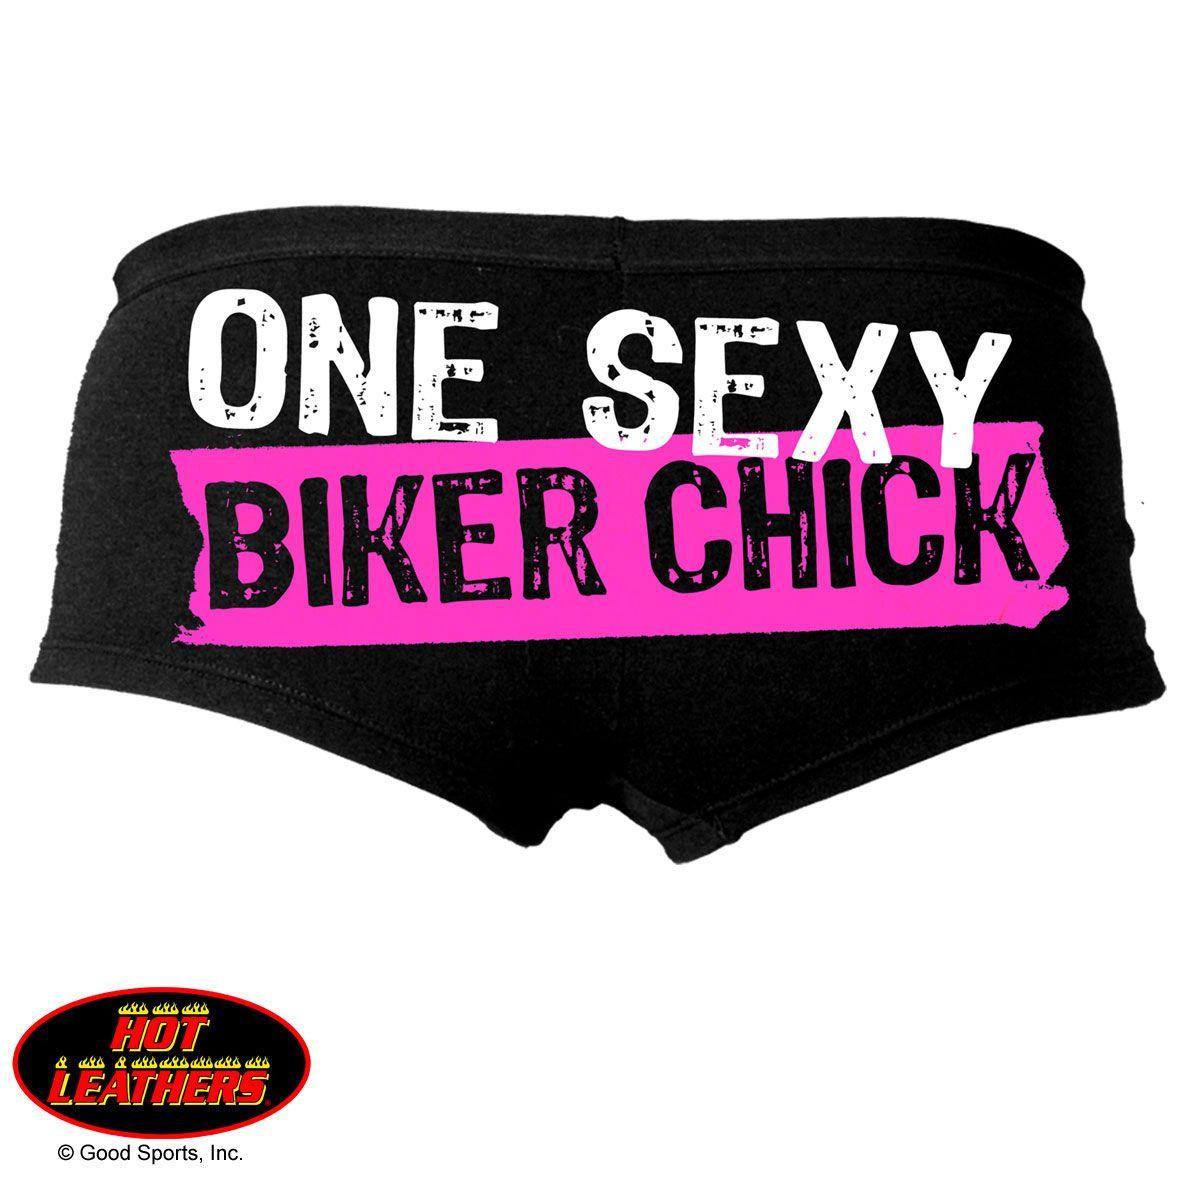 One sexy biker chick